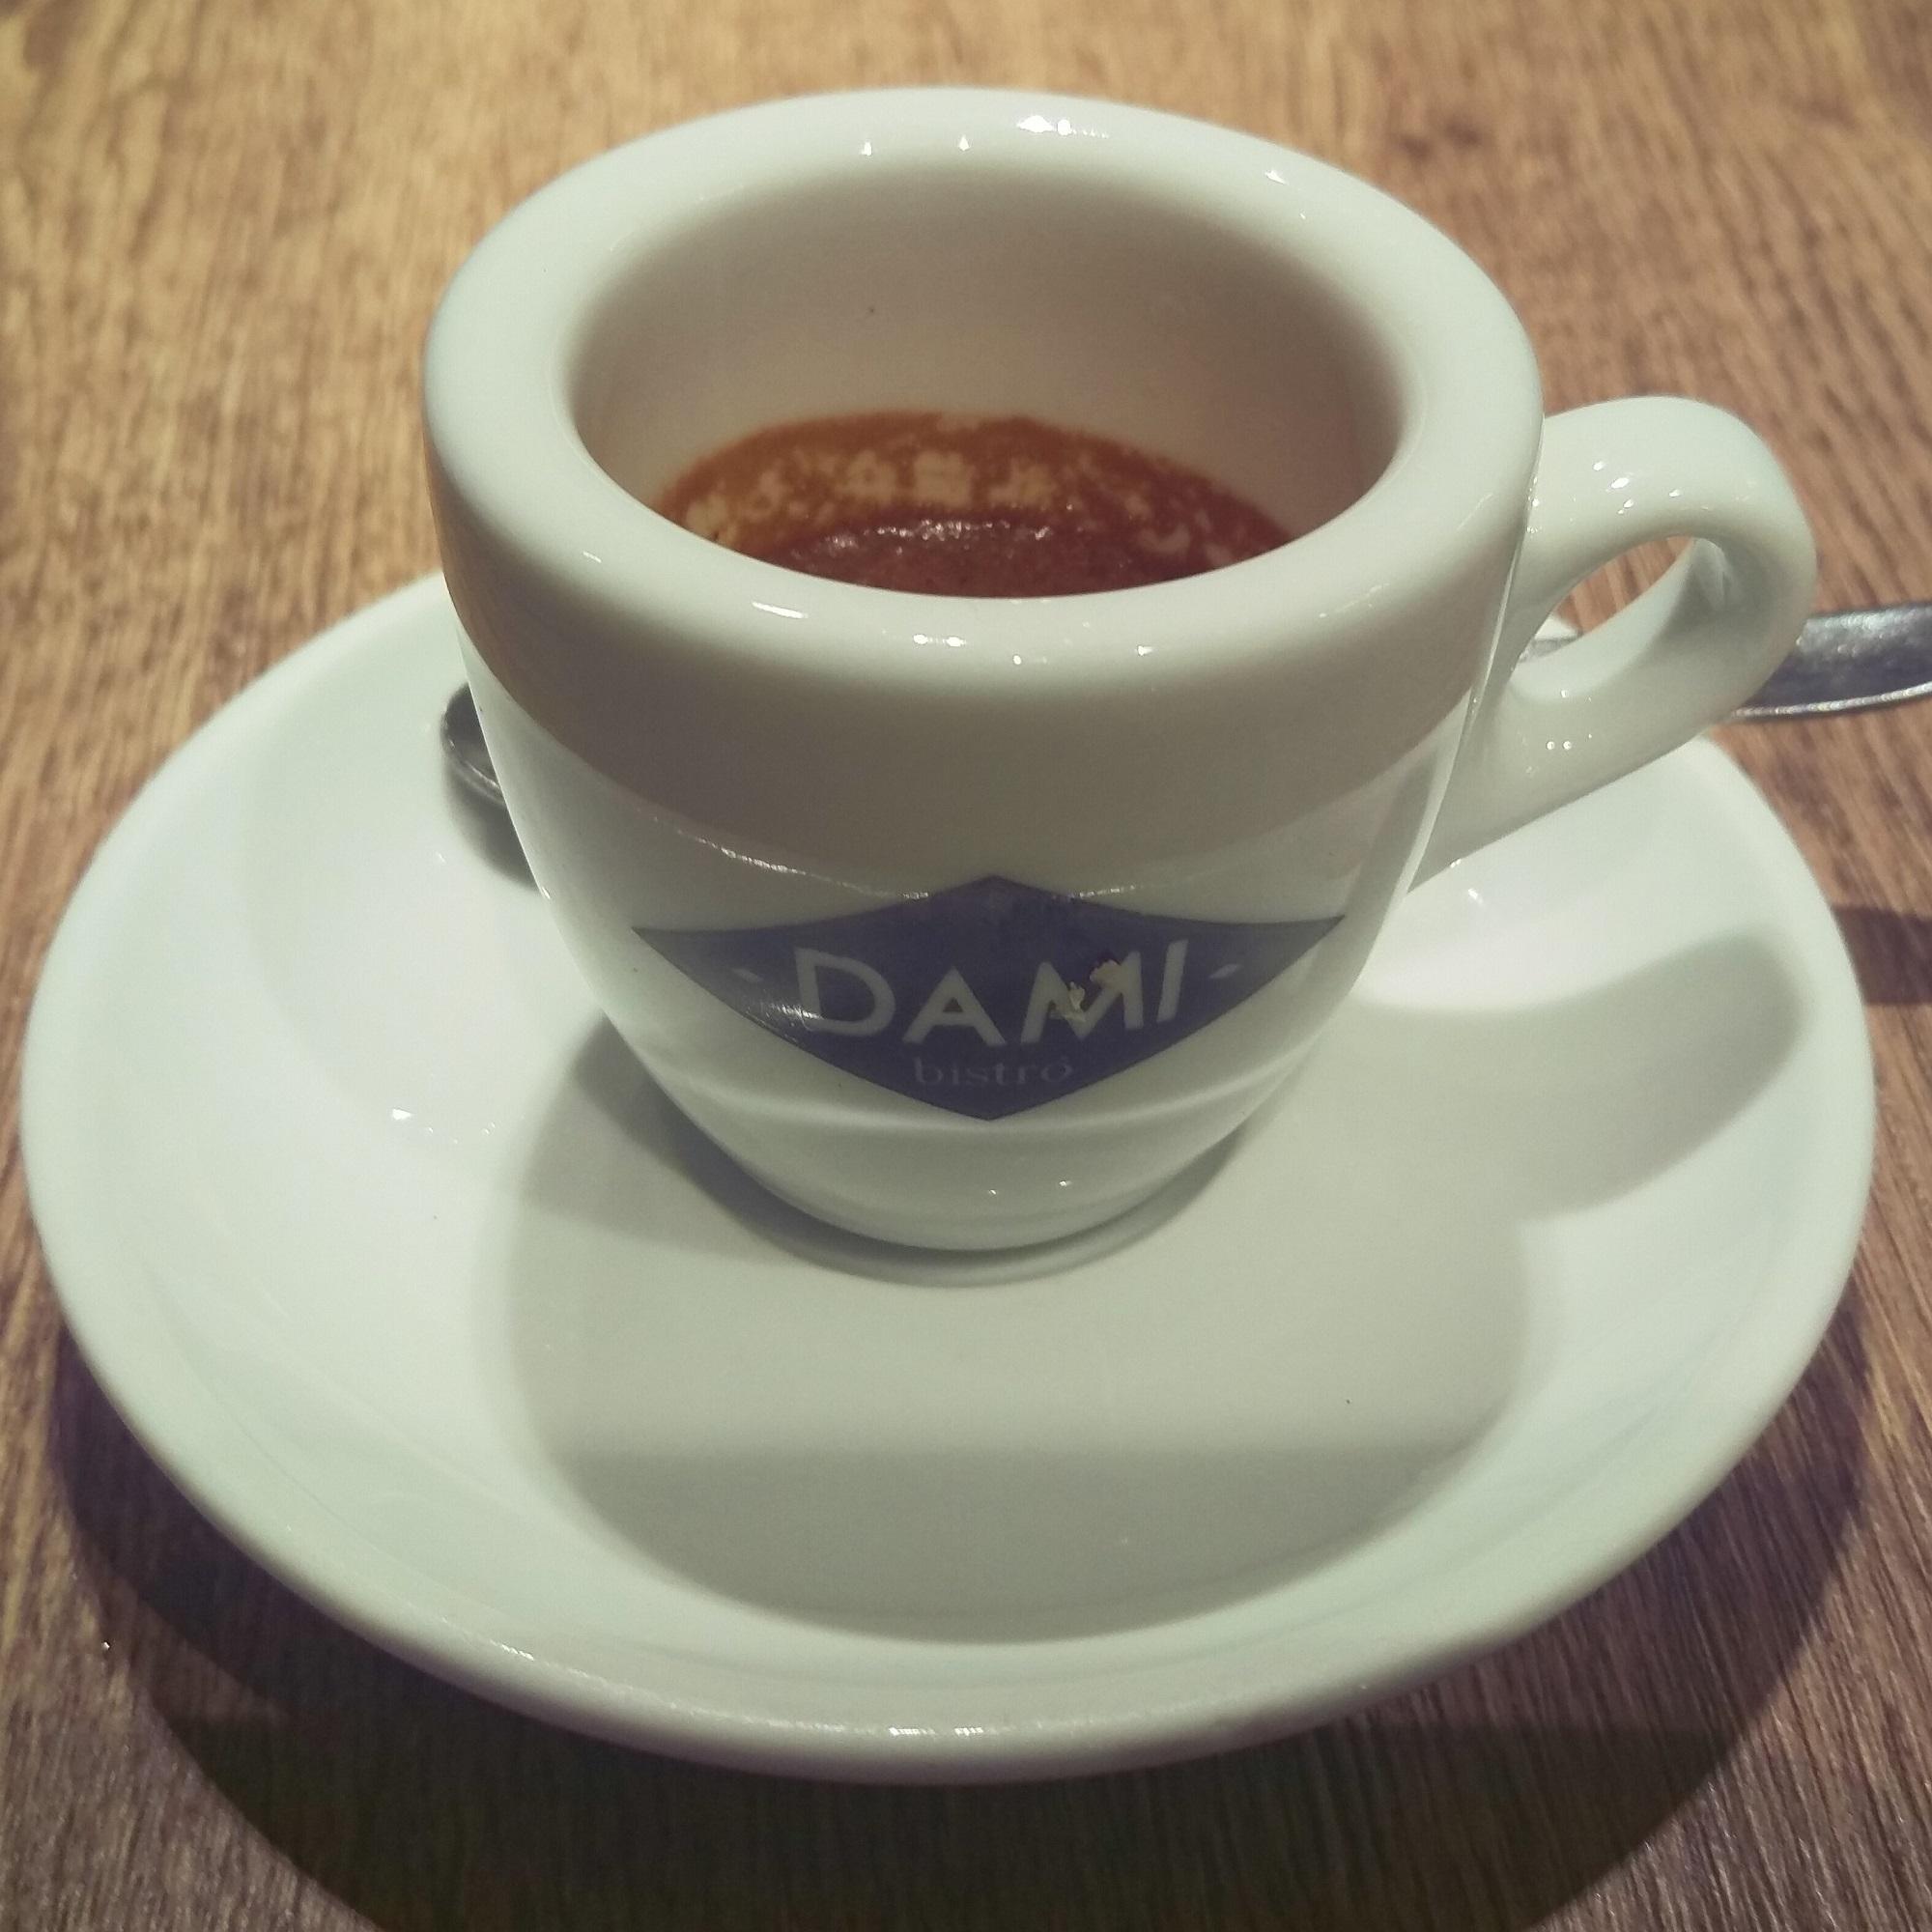 A typical espresso in a typical Italian espresso bar, Dami Bistro, near the Spanish Steps.